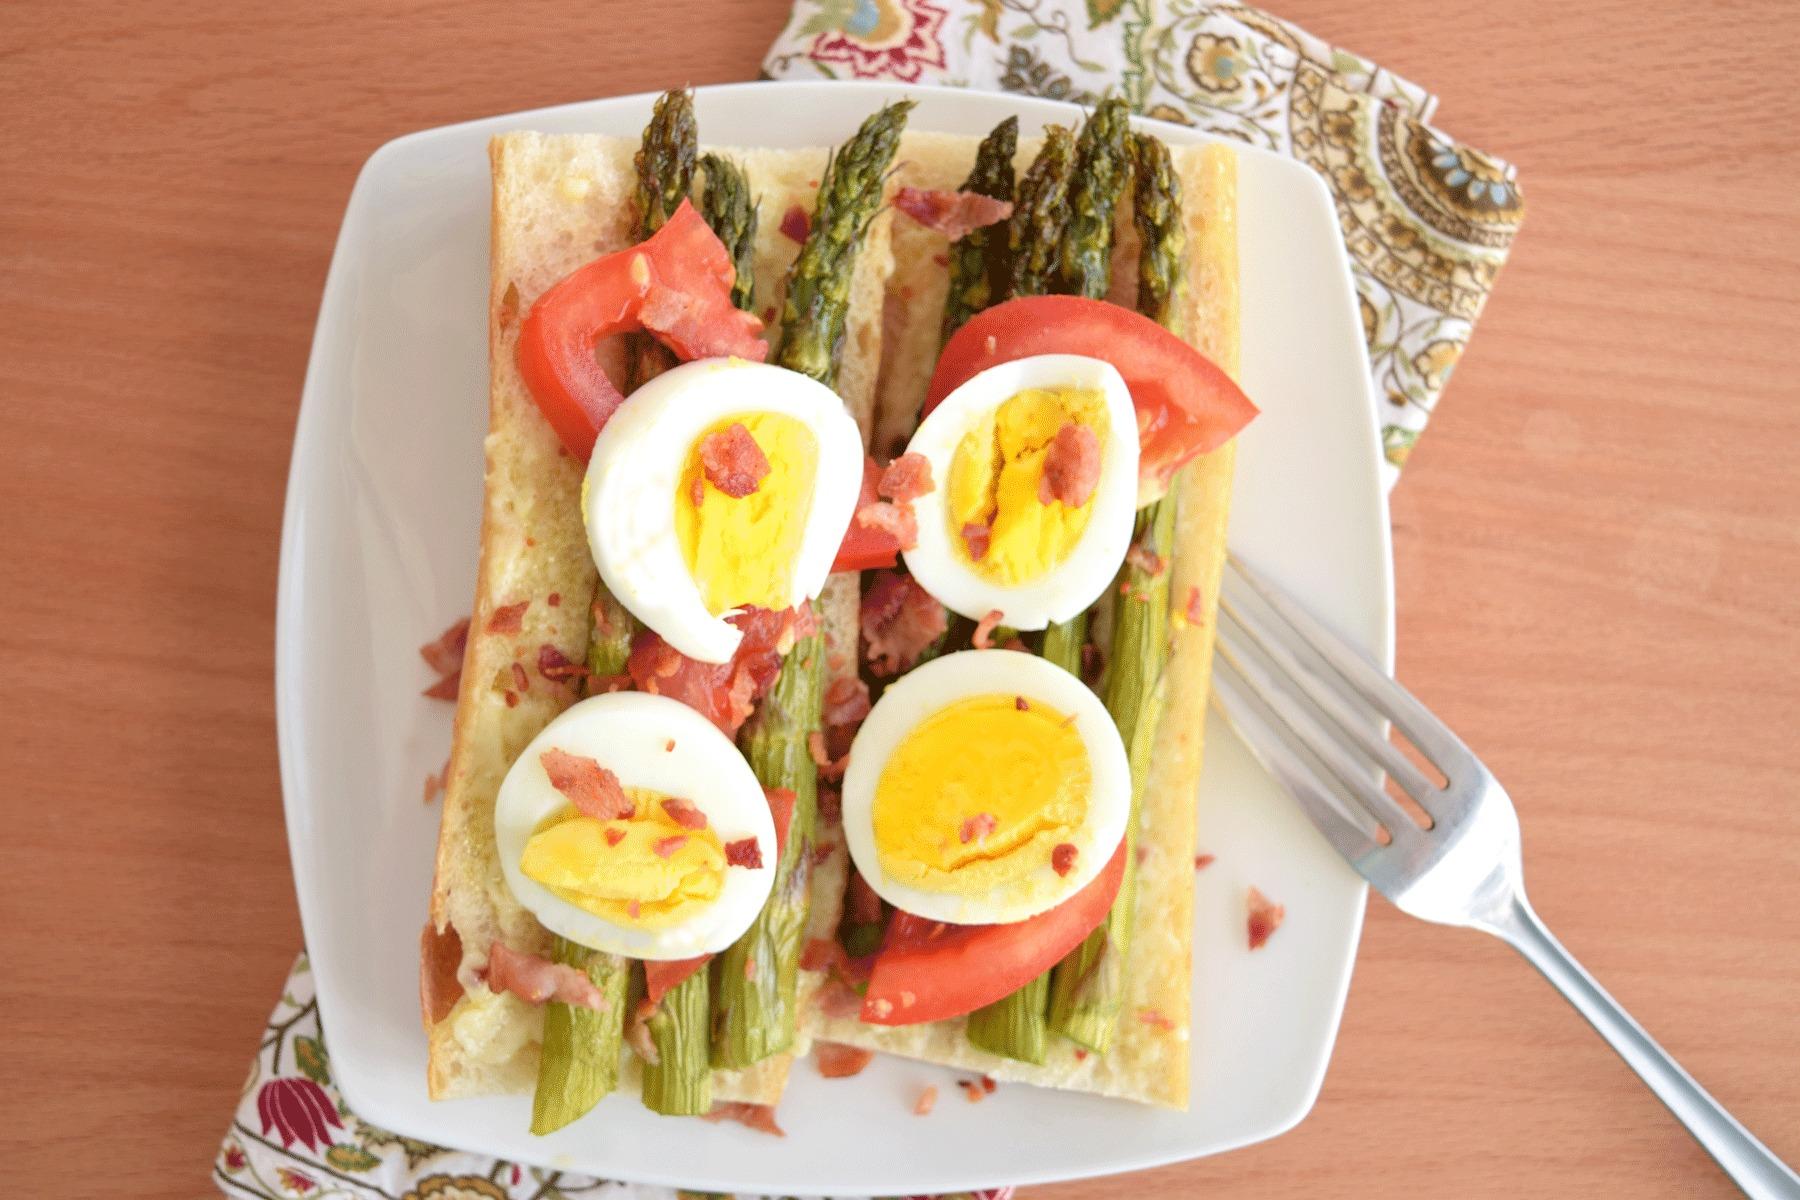 egg-sandwich-hellolifeonline.com